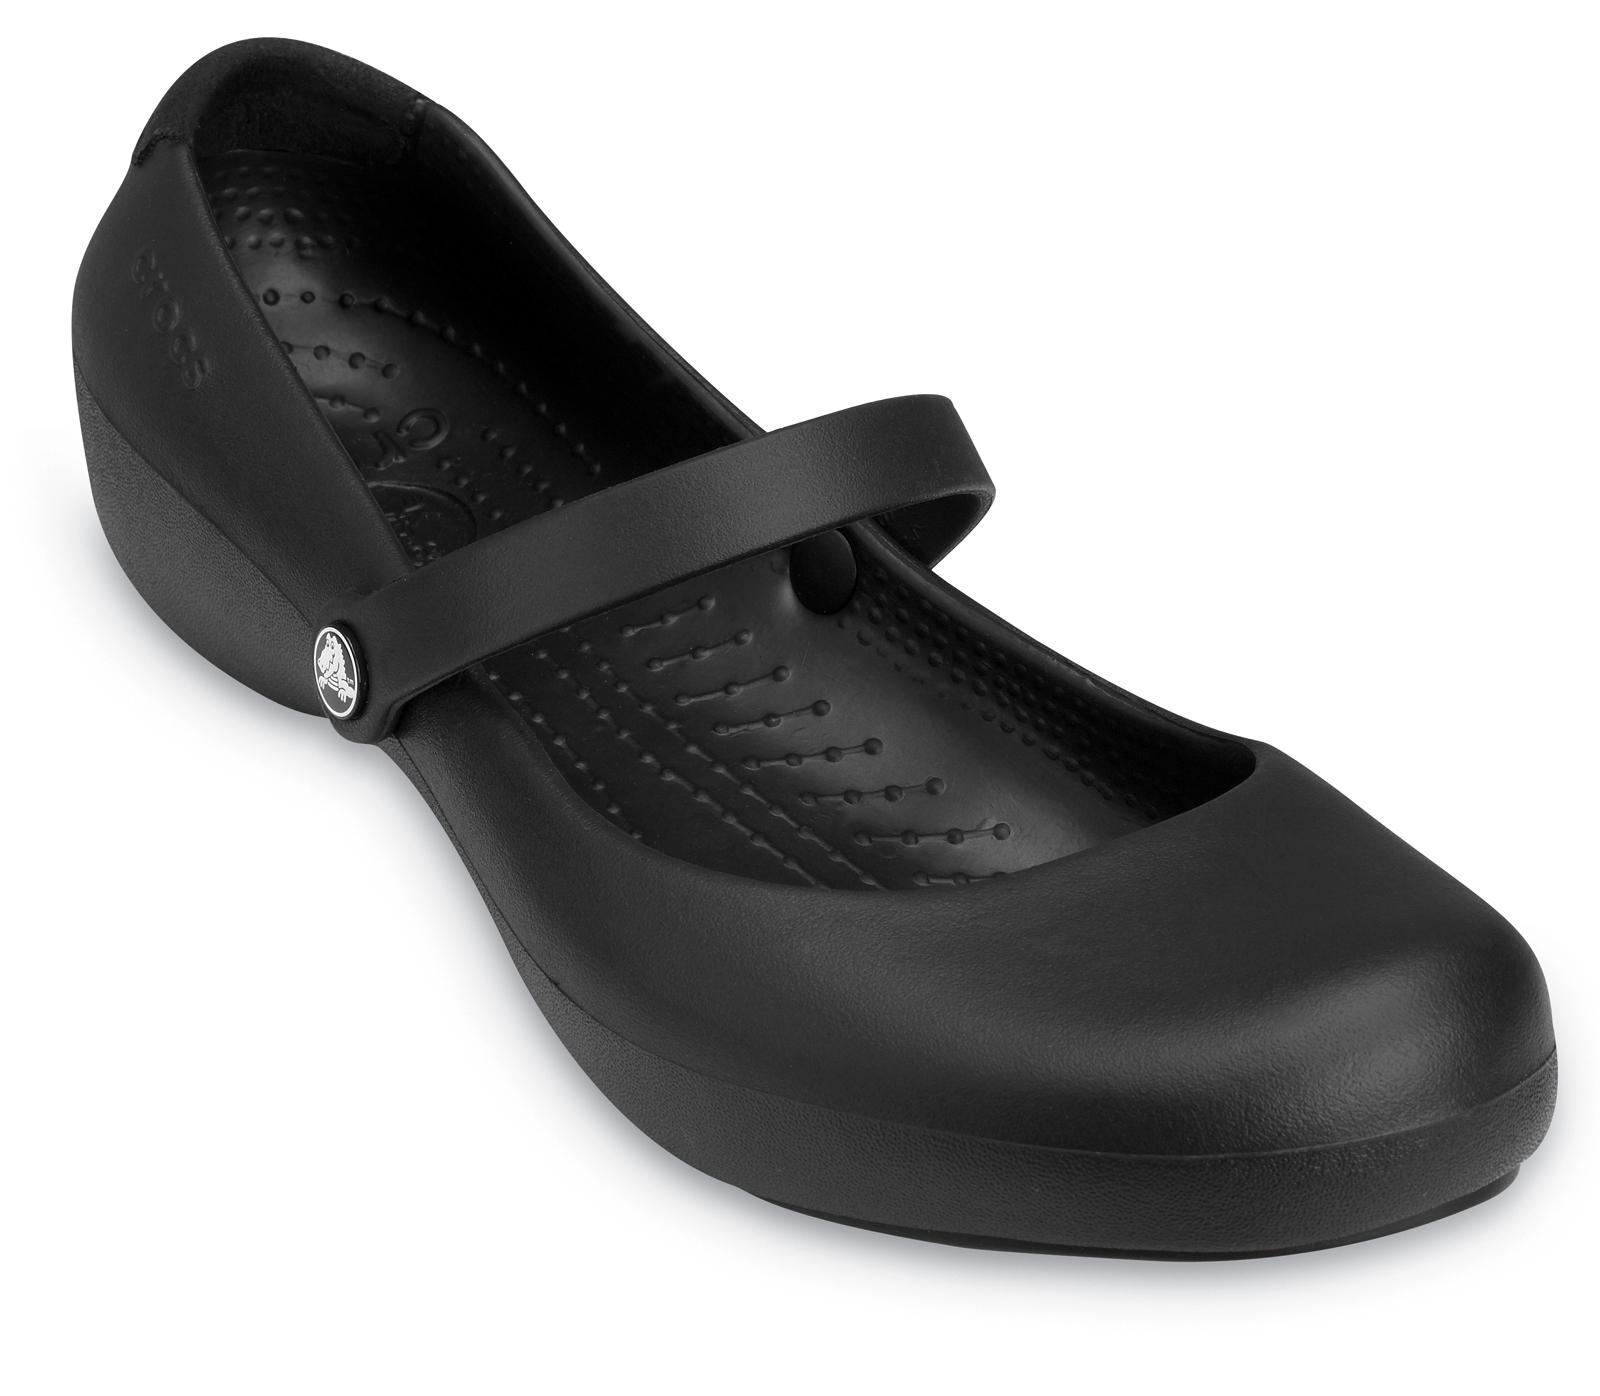 Crocs Alice Black Work Clogs Flat Mary Jane Womens Shoes ... - photo#41